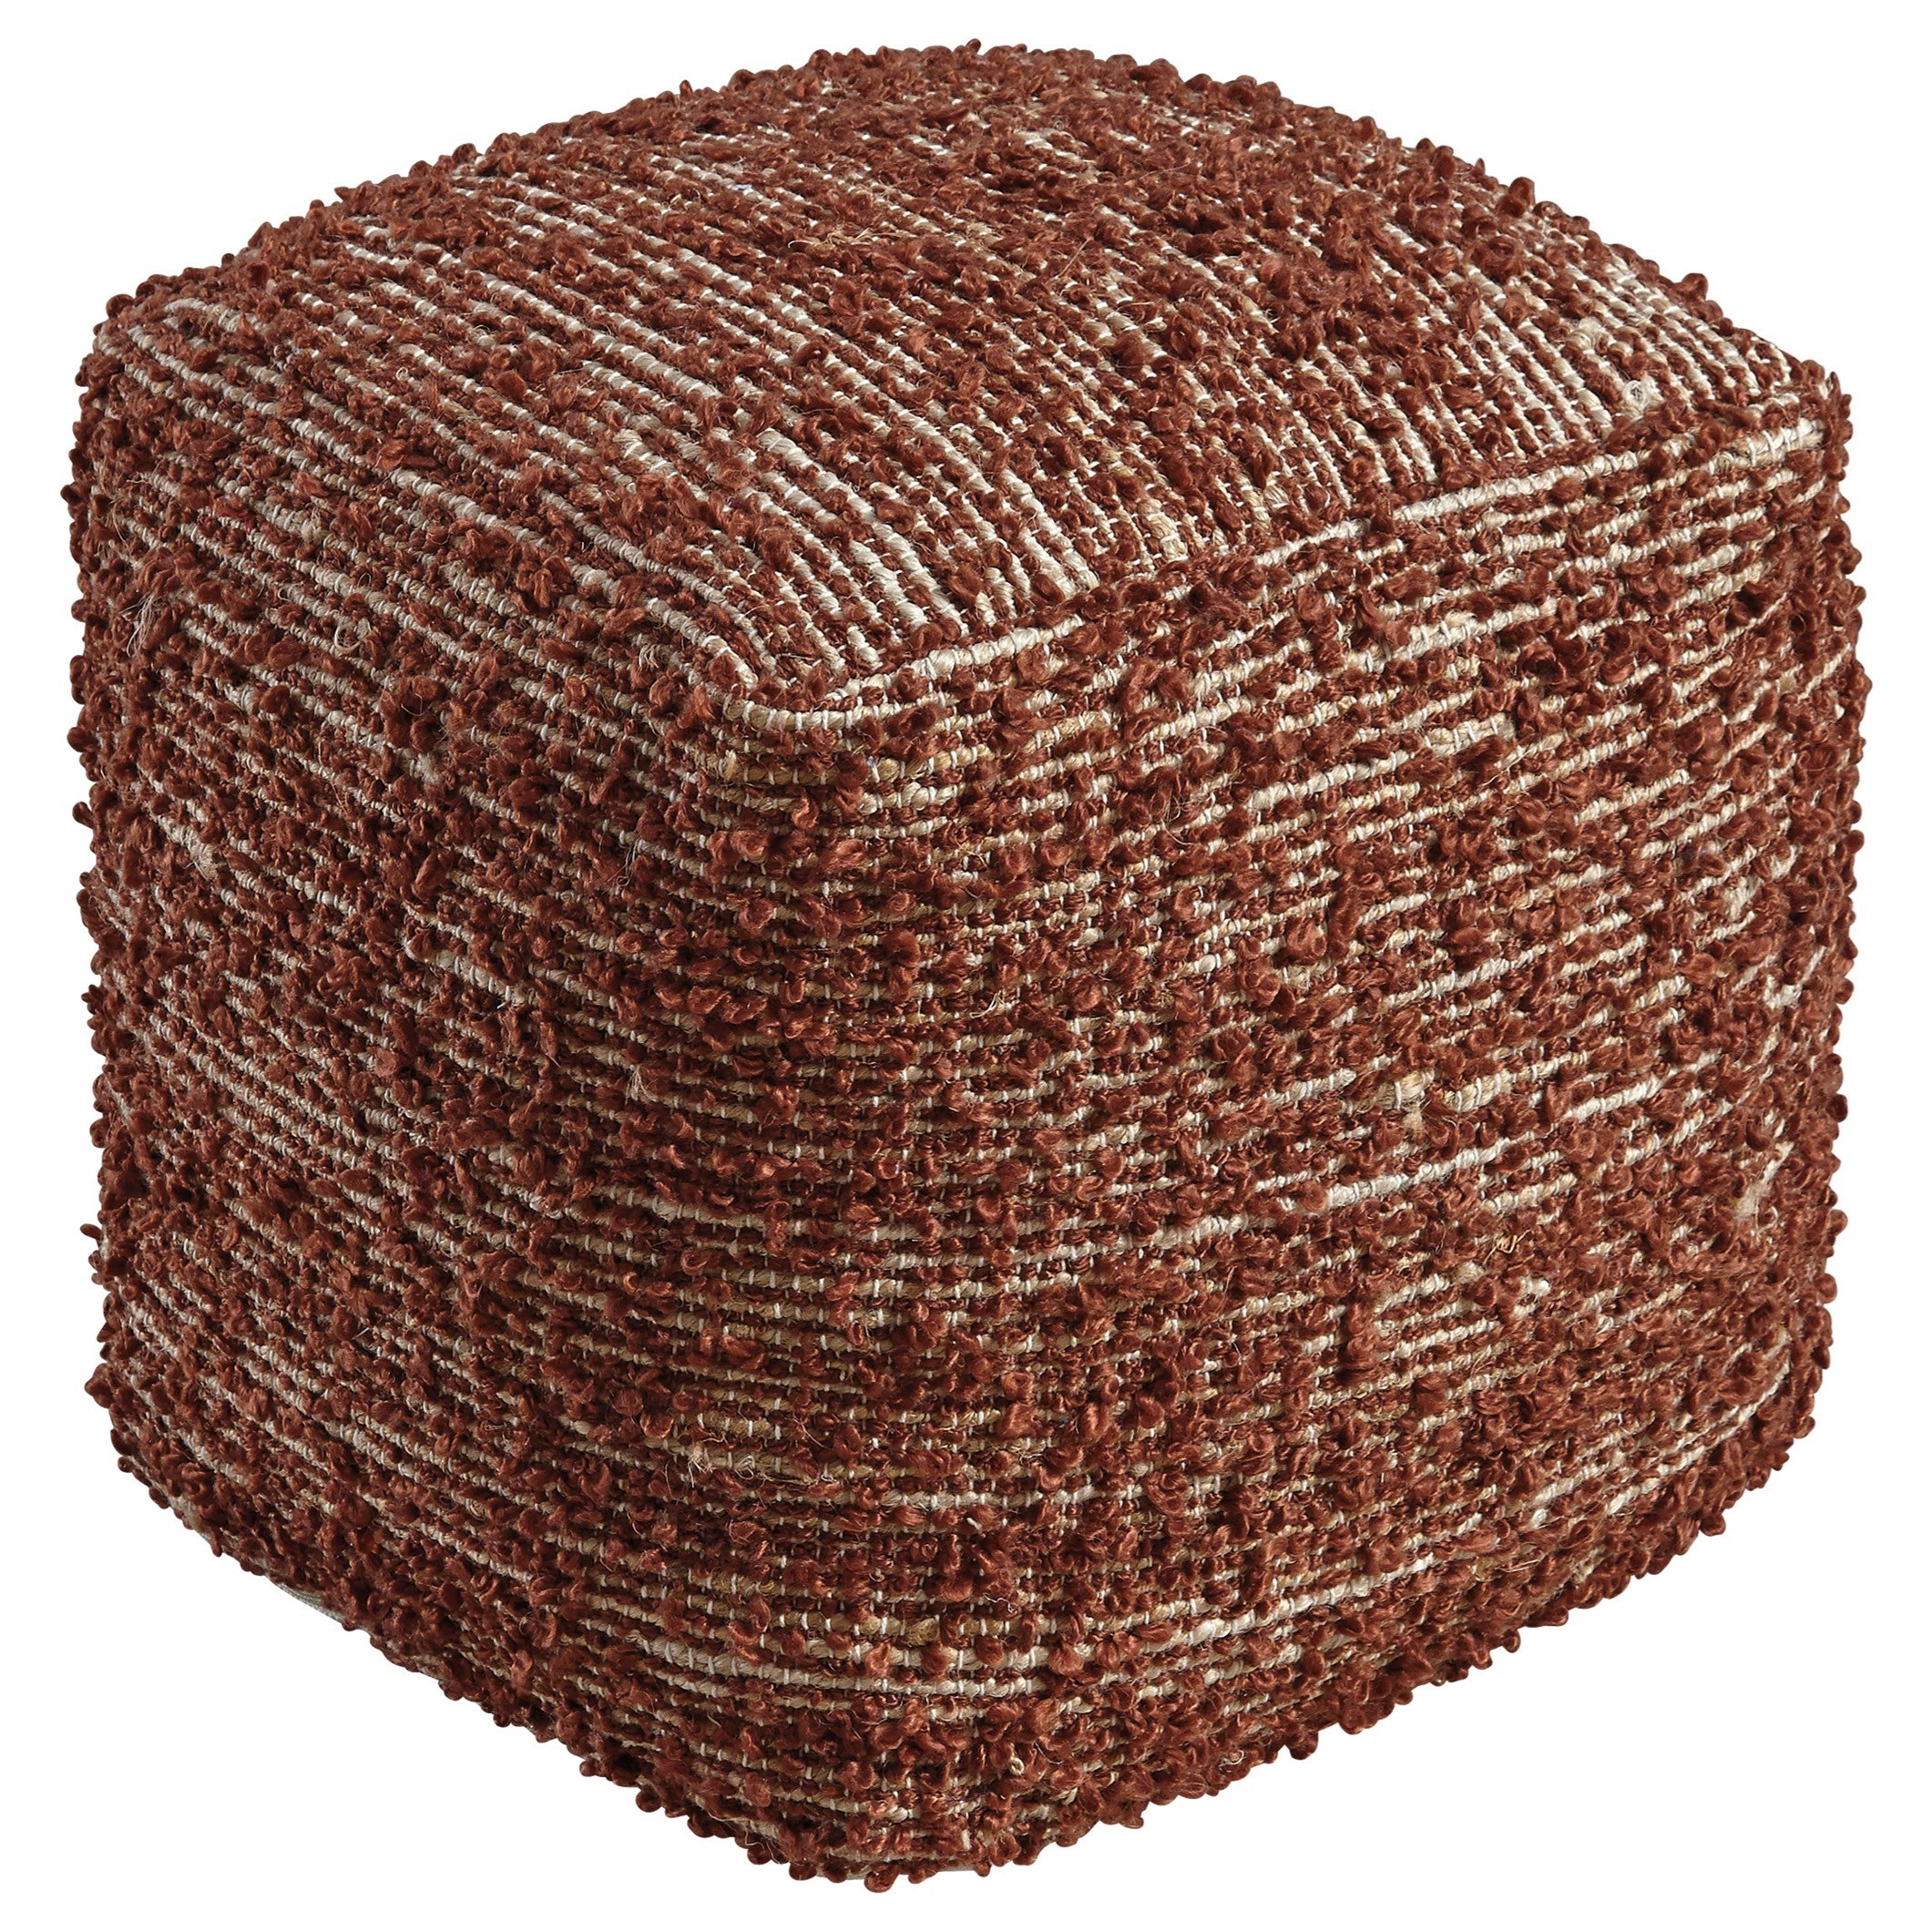 signature design by ashley poufs darita brown pouf. Black Bedroom Furniture Sets. Home Design Ideas